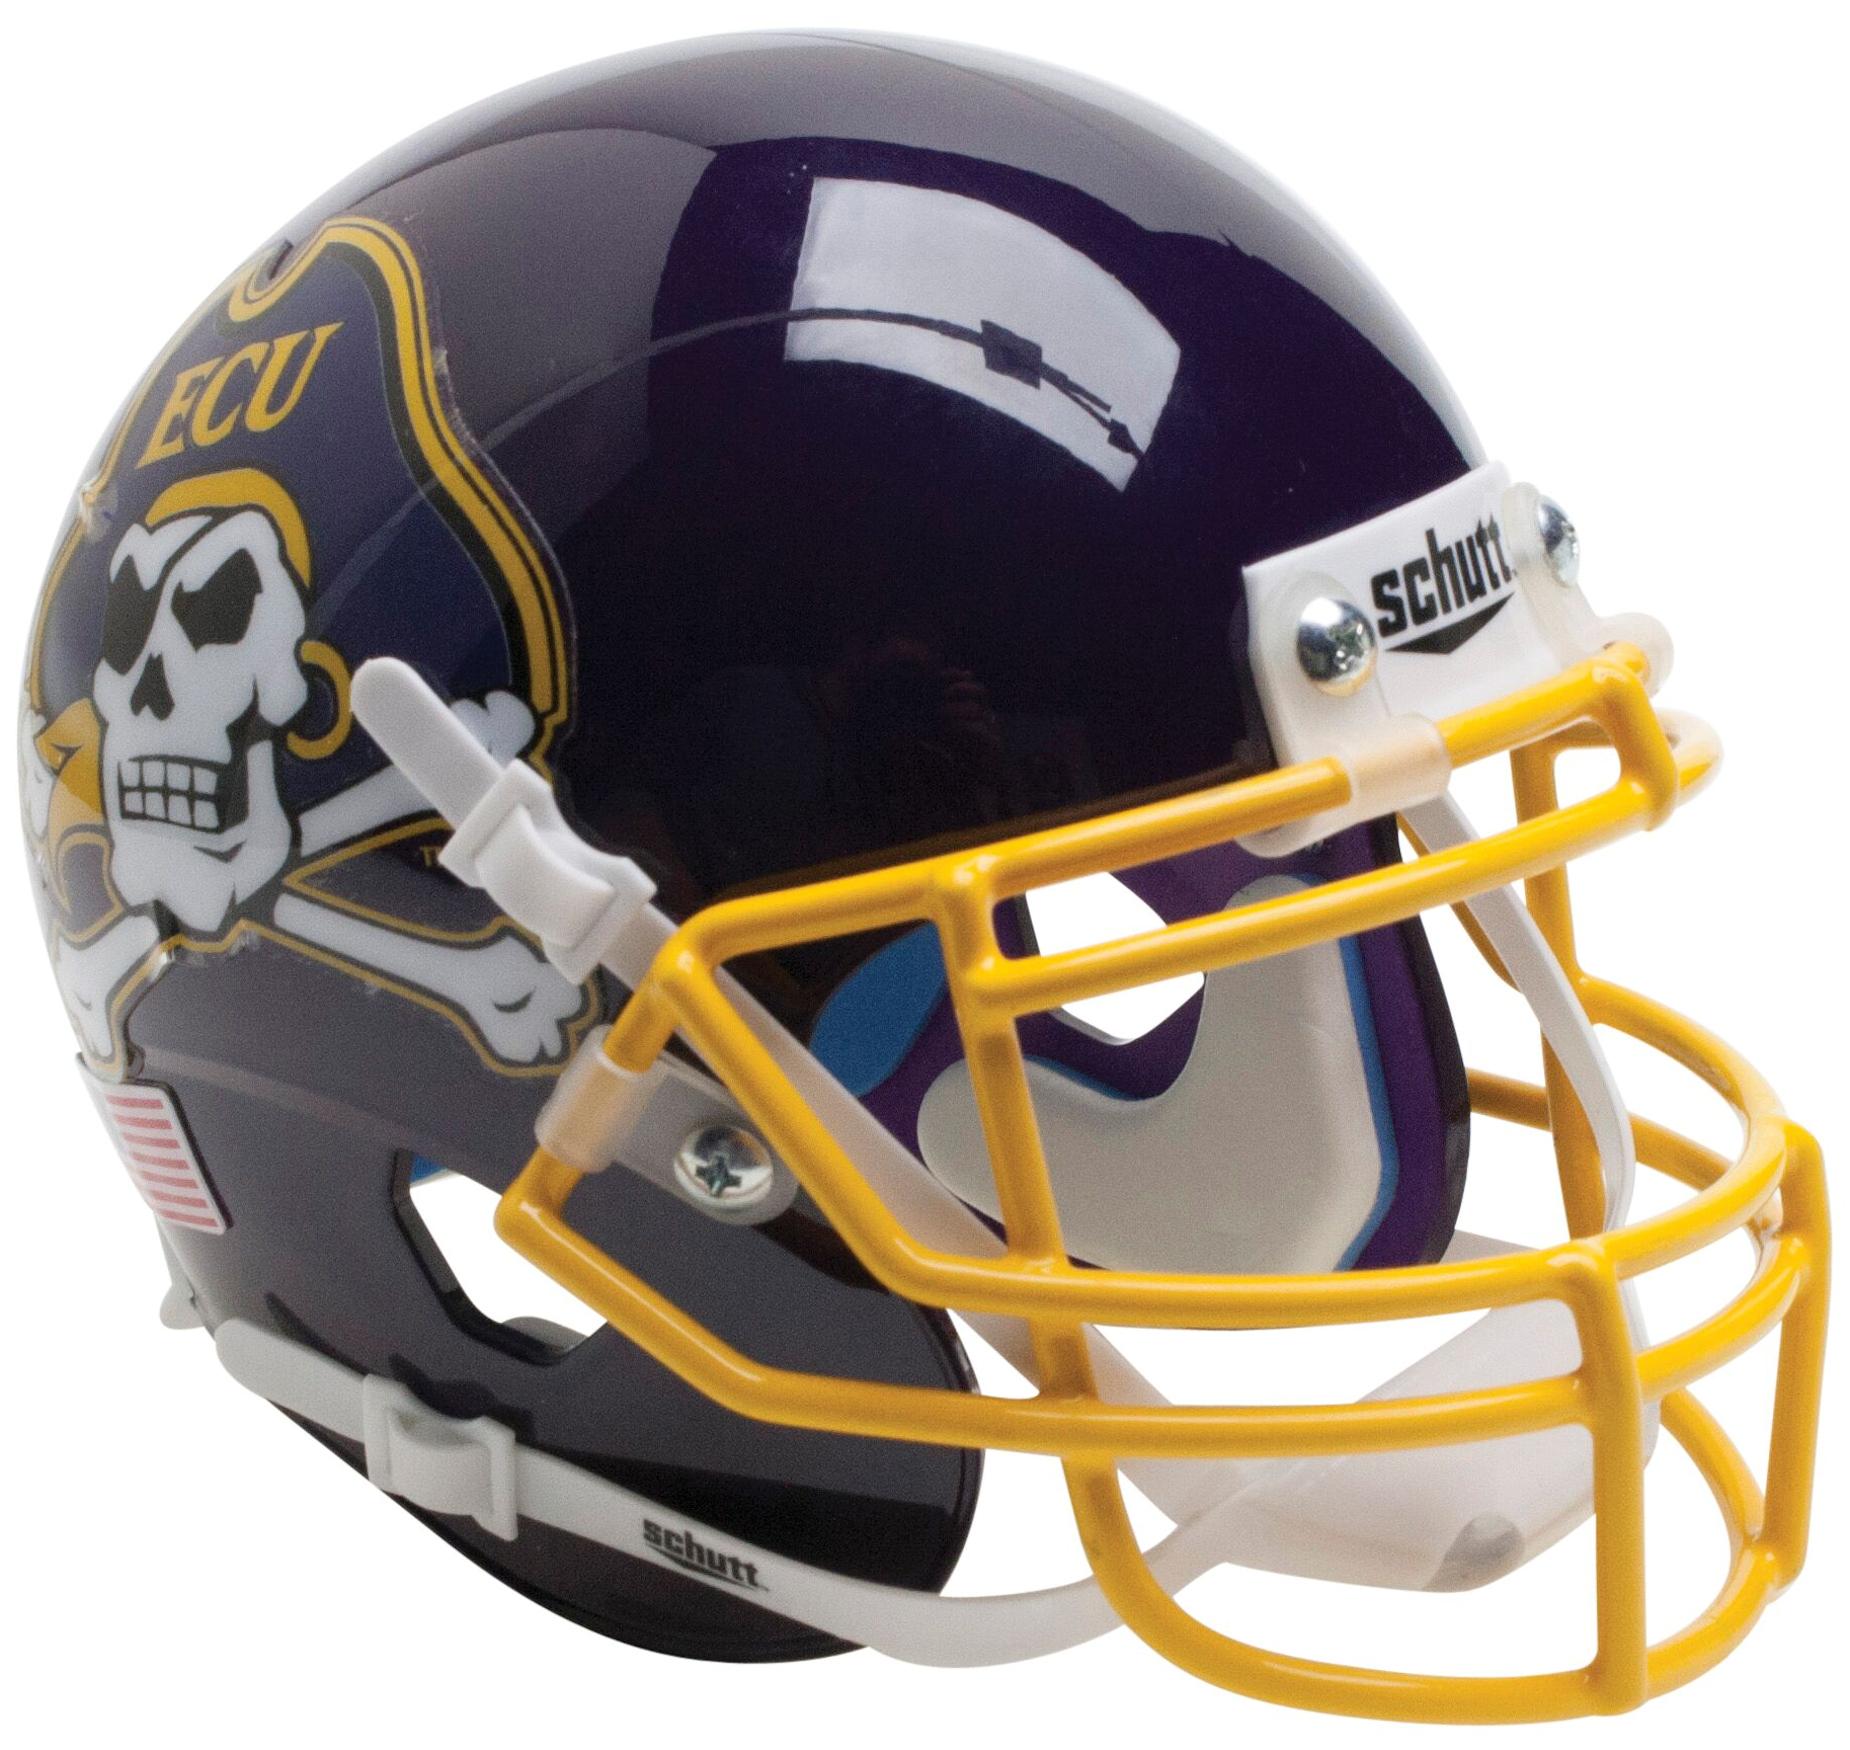 East Carolina Pirates Authentic College XP Football Helmet Schutt <B>Yellow Mask</B>